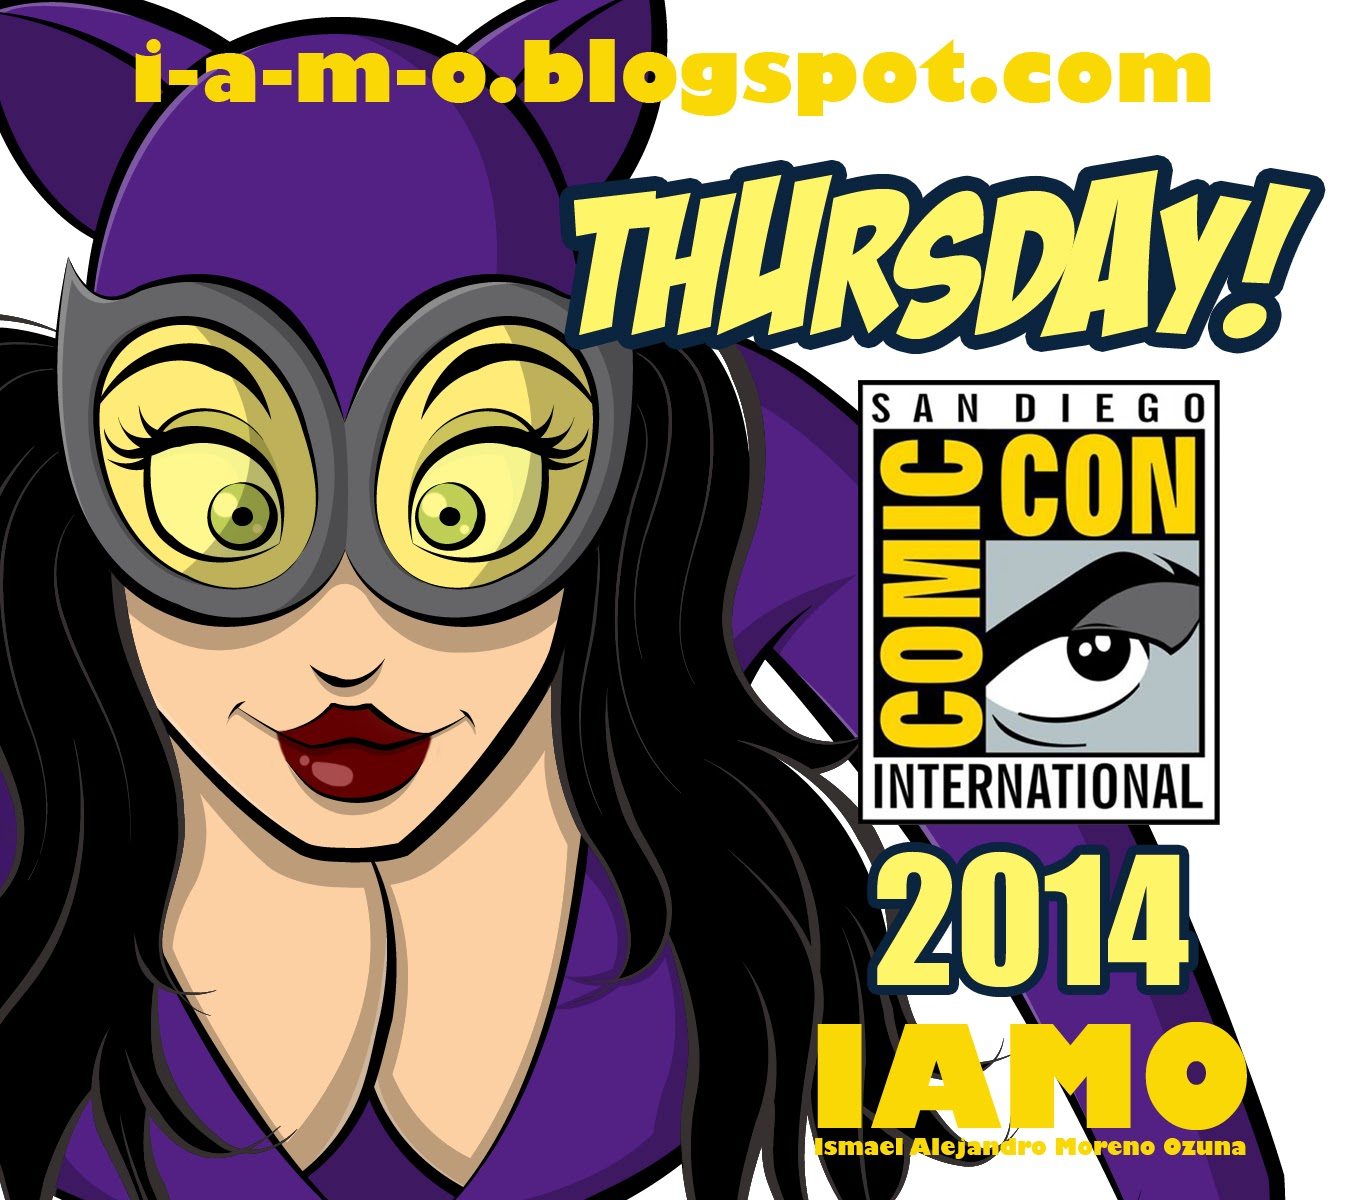 IAMO-SDCC-2014-Thursday_Badge+copy.jpg